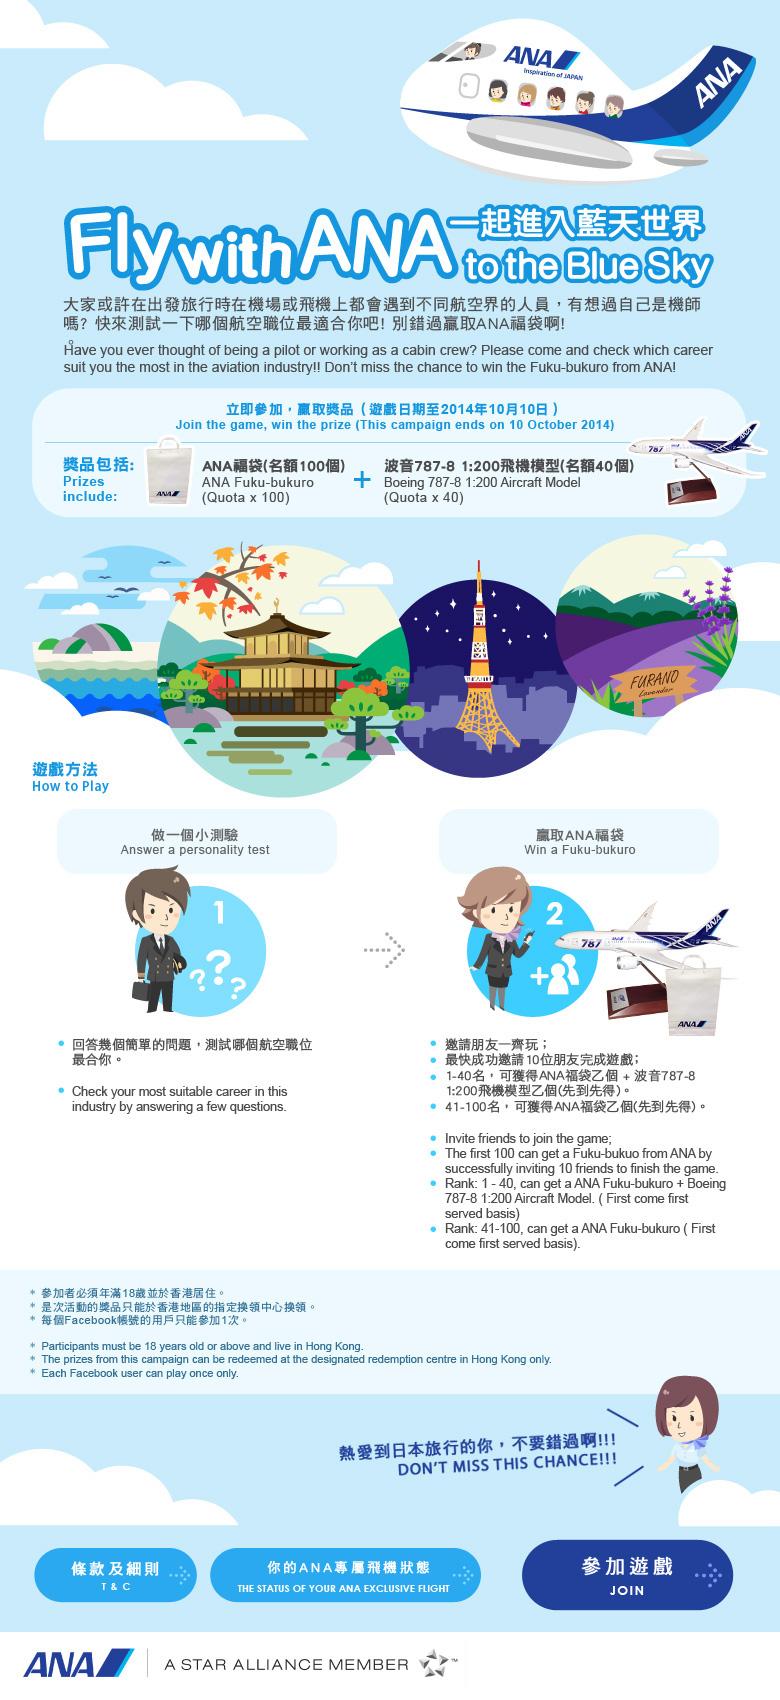 ana Travel airline japan